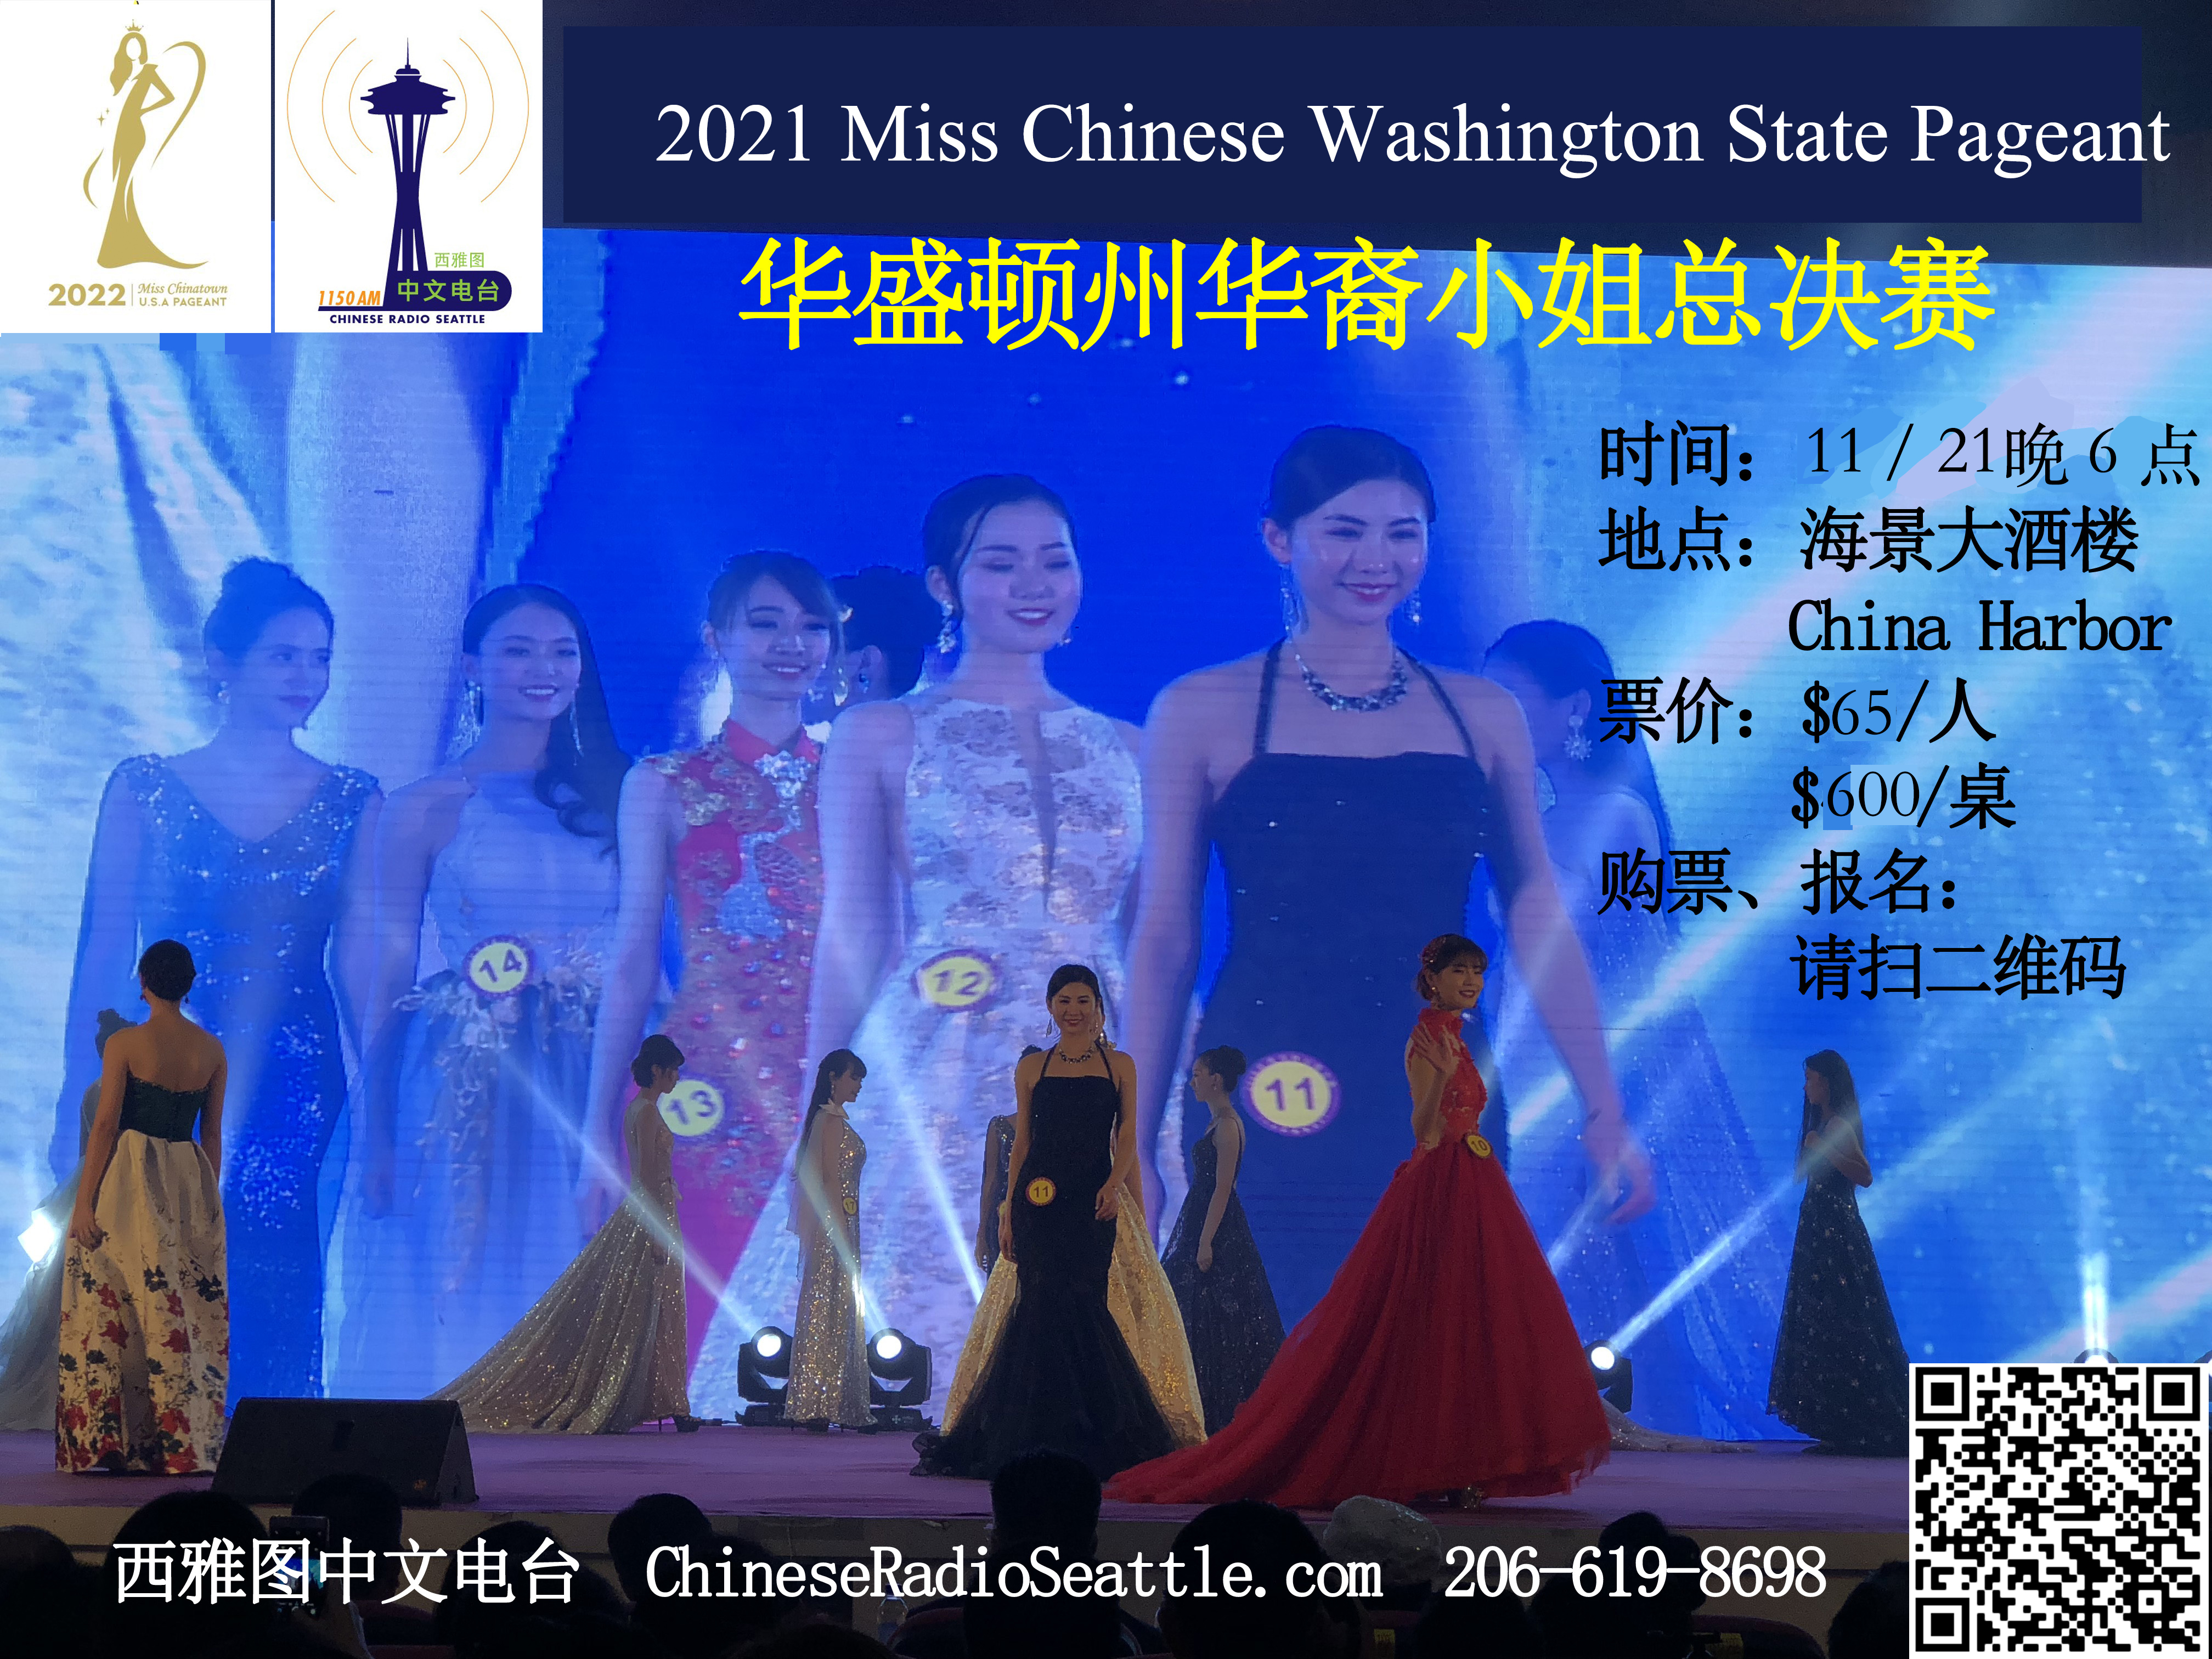 miss_chinese_washington2021